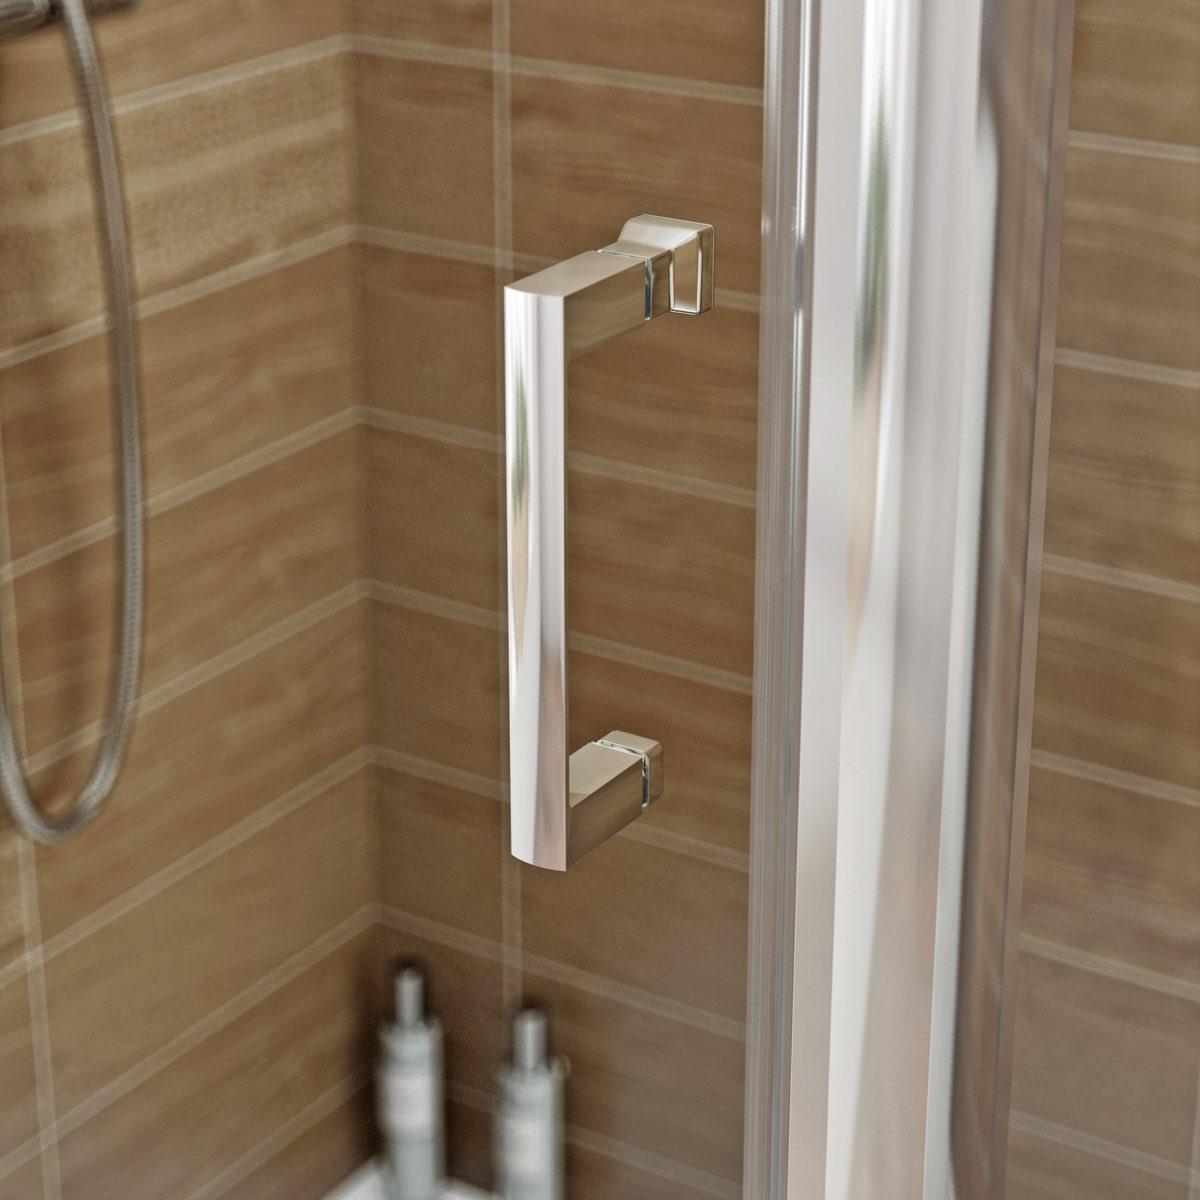 V6 pivot enclosure 1000 x 800 for 1000 pivot shower door